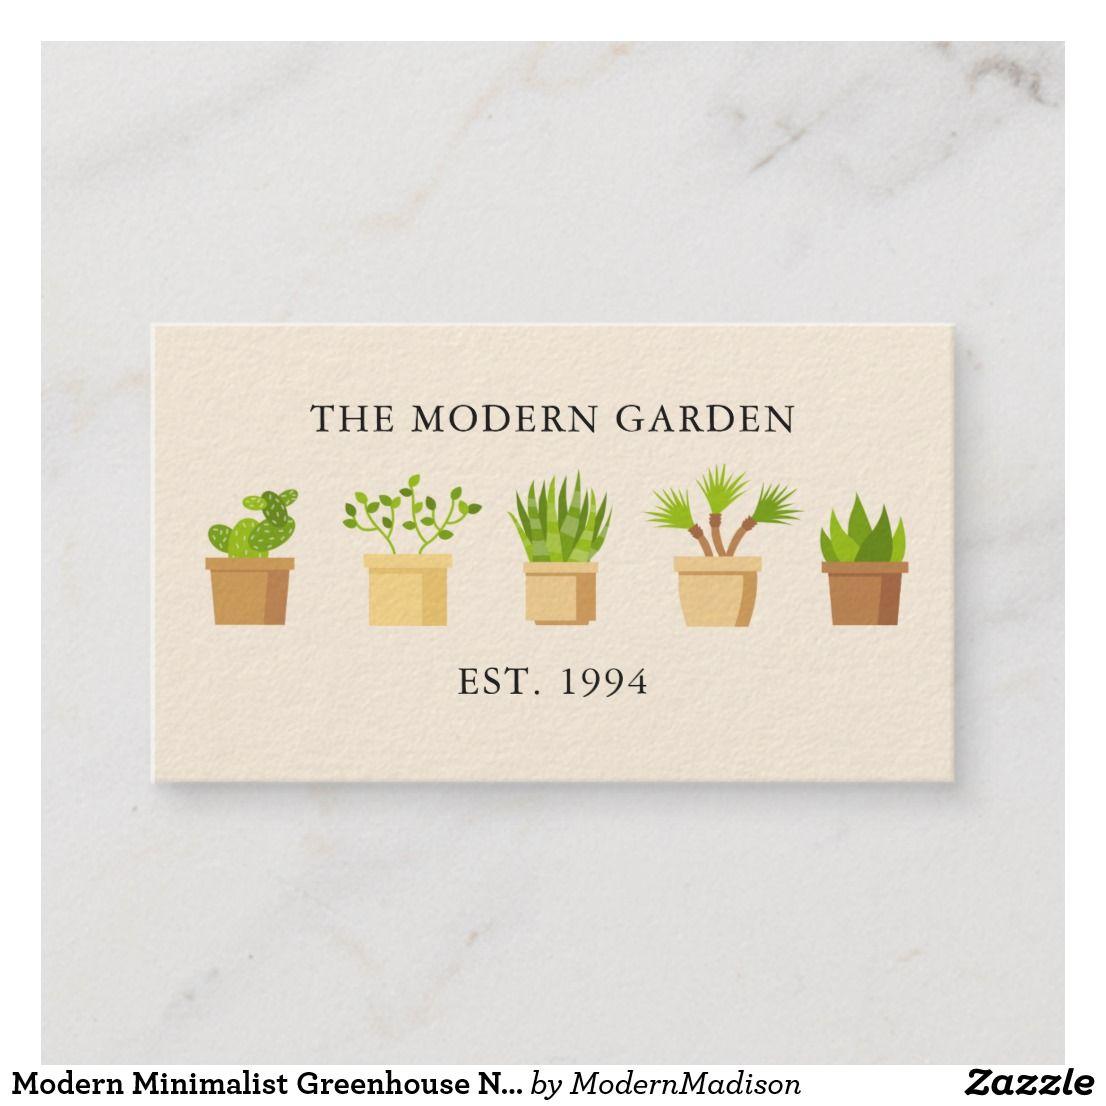 Greenhouse Nursery Plants Business Card